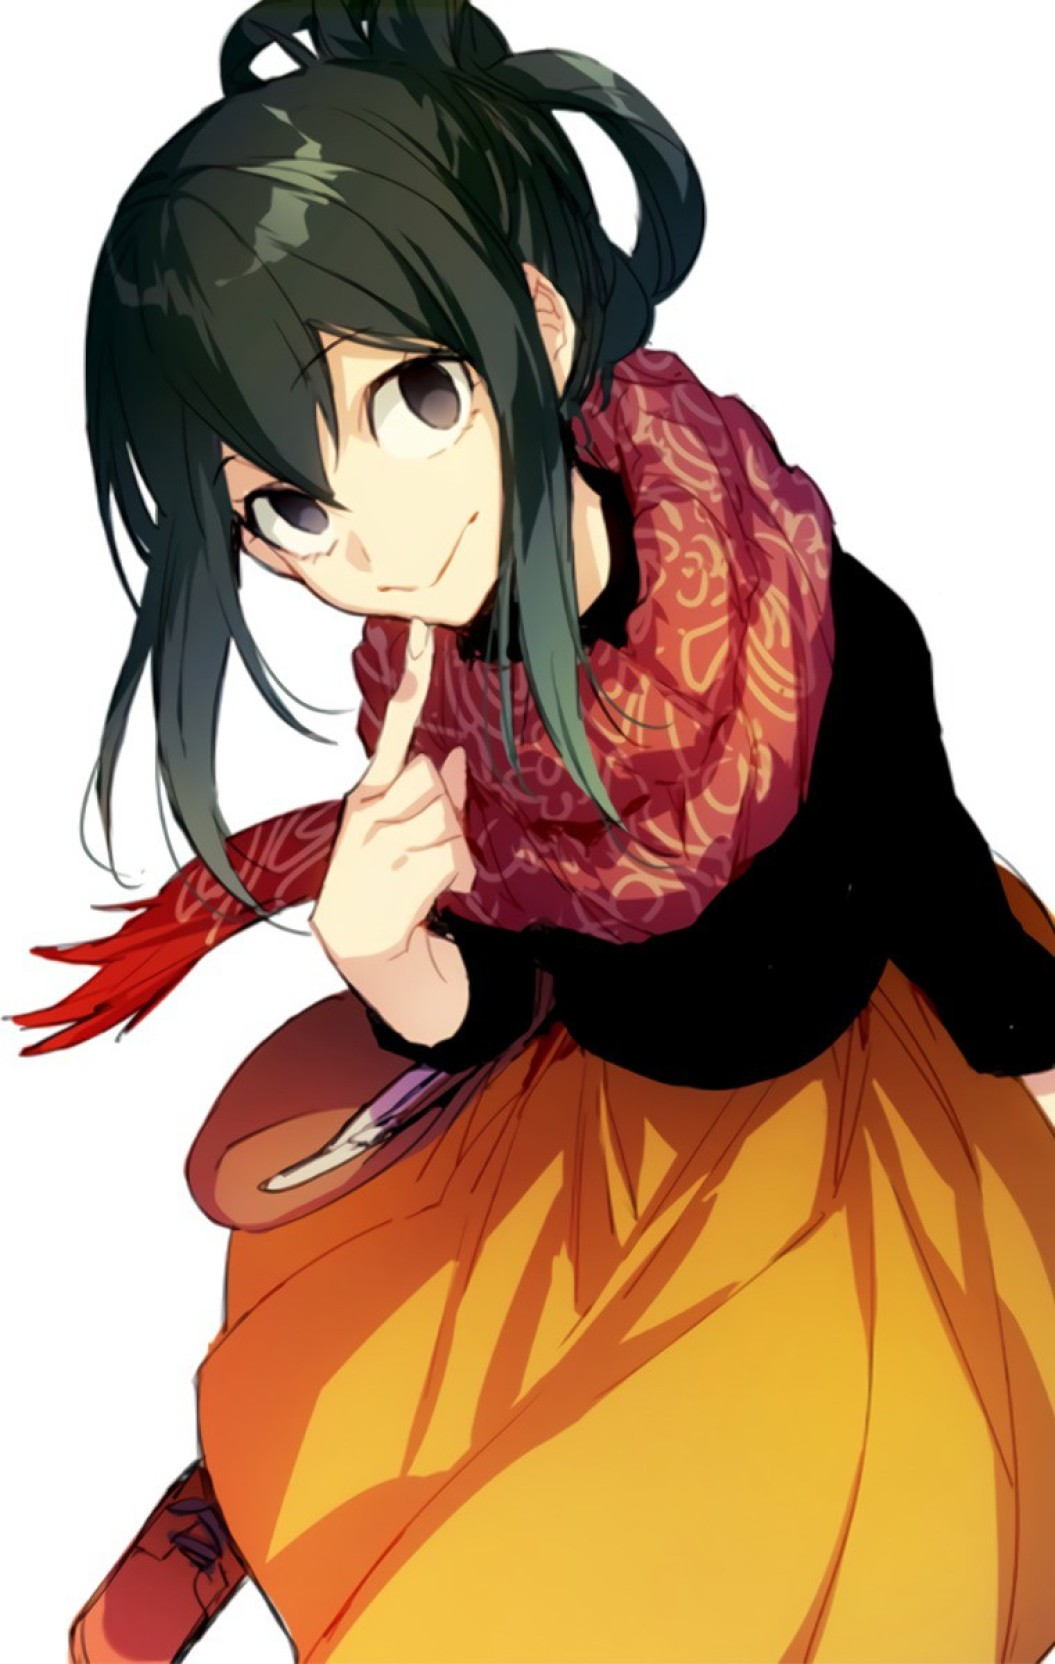 Athah Anime My Hero Academia Tsuyu Asui 13 19 Inches Wall